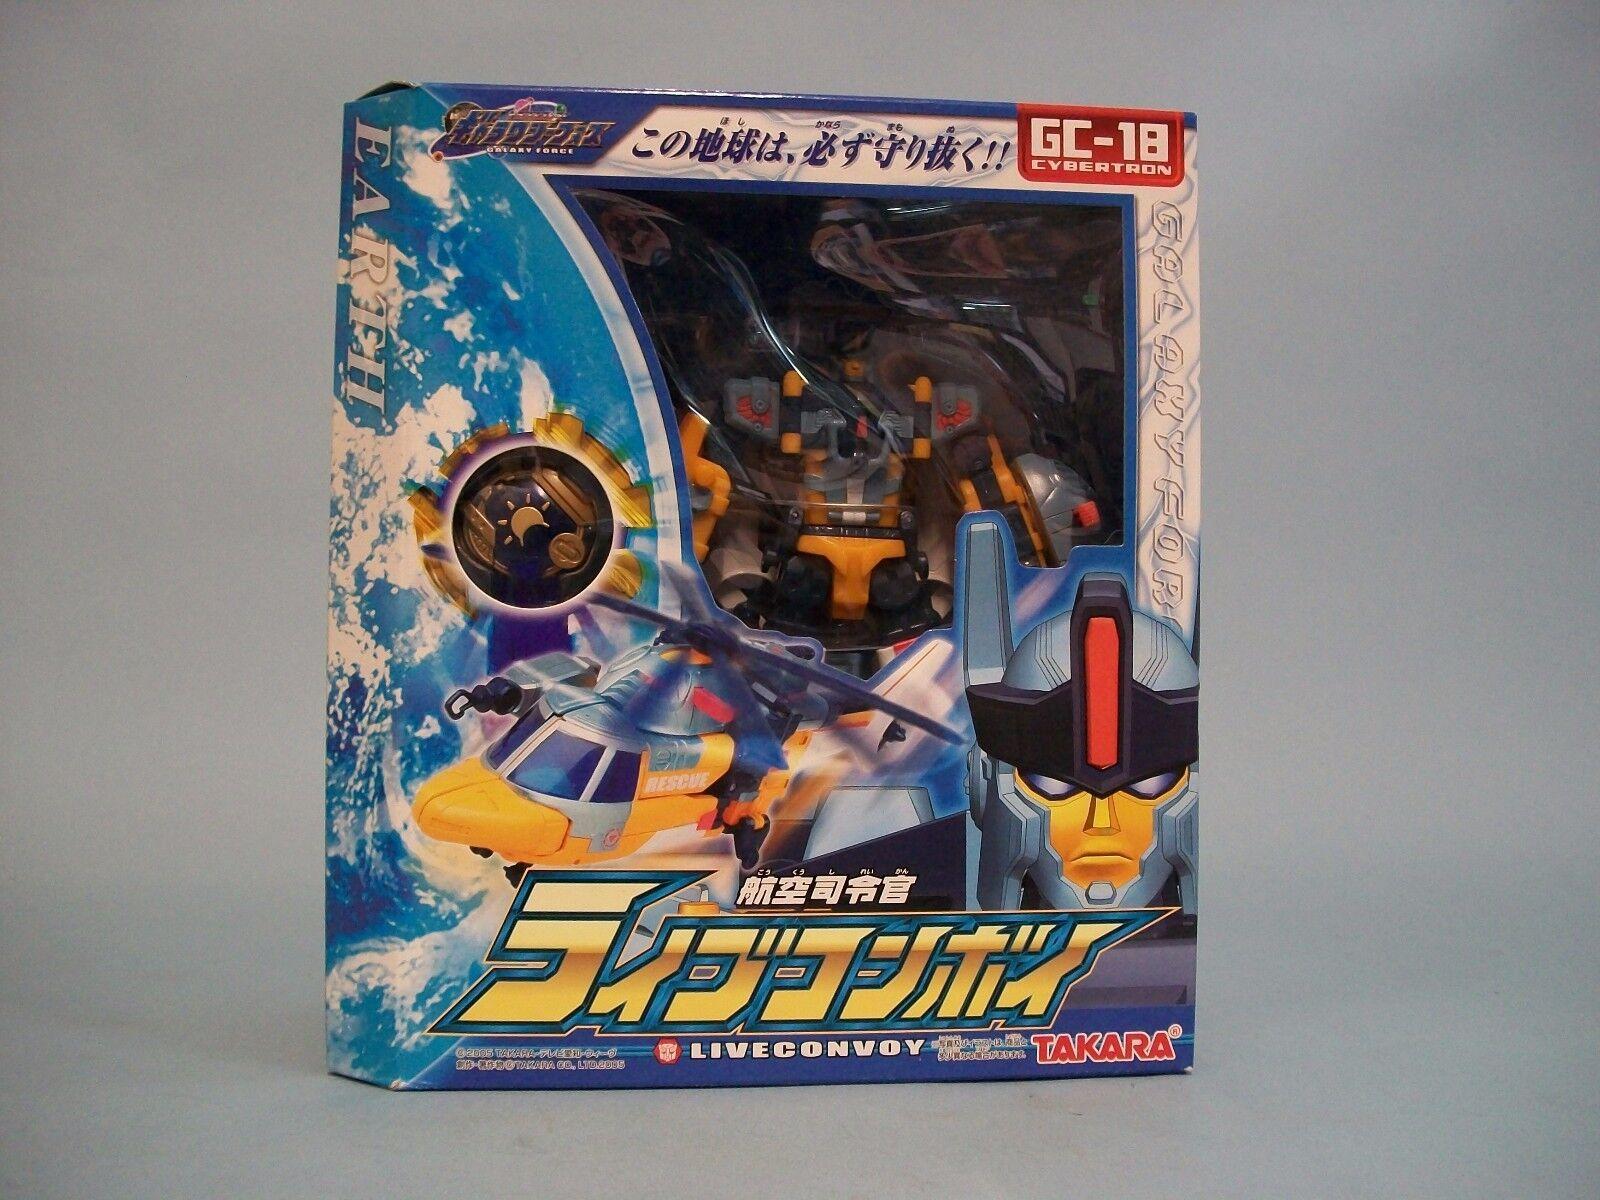 Takara Galaxy Force GC-18 Cybertron Liveconvoy Transformers